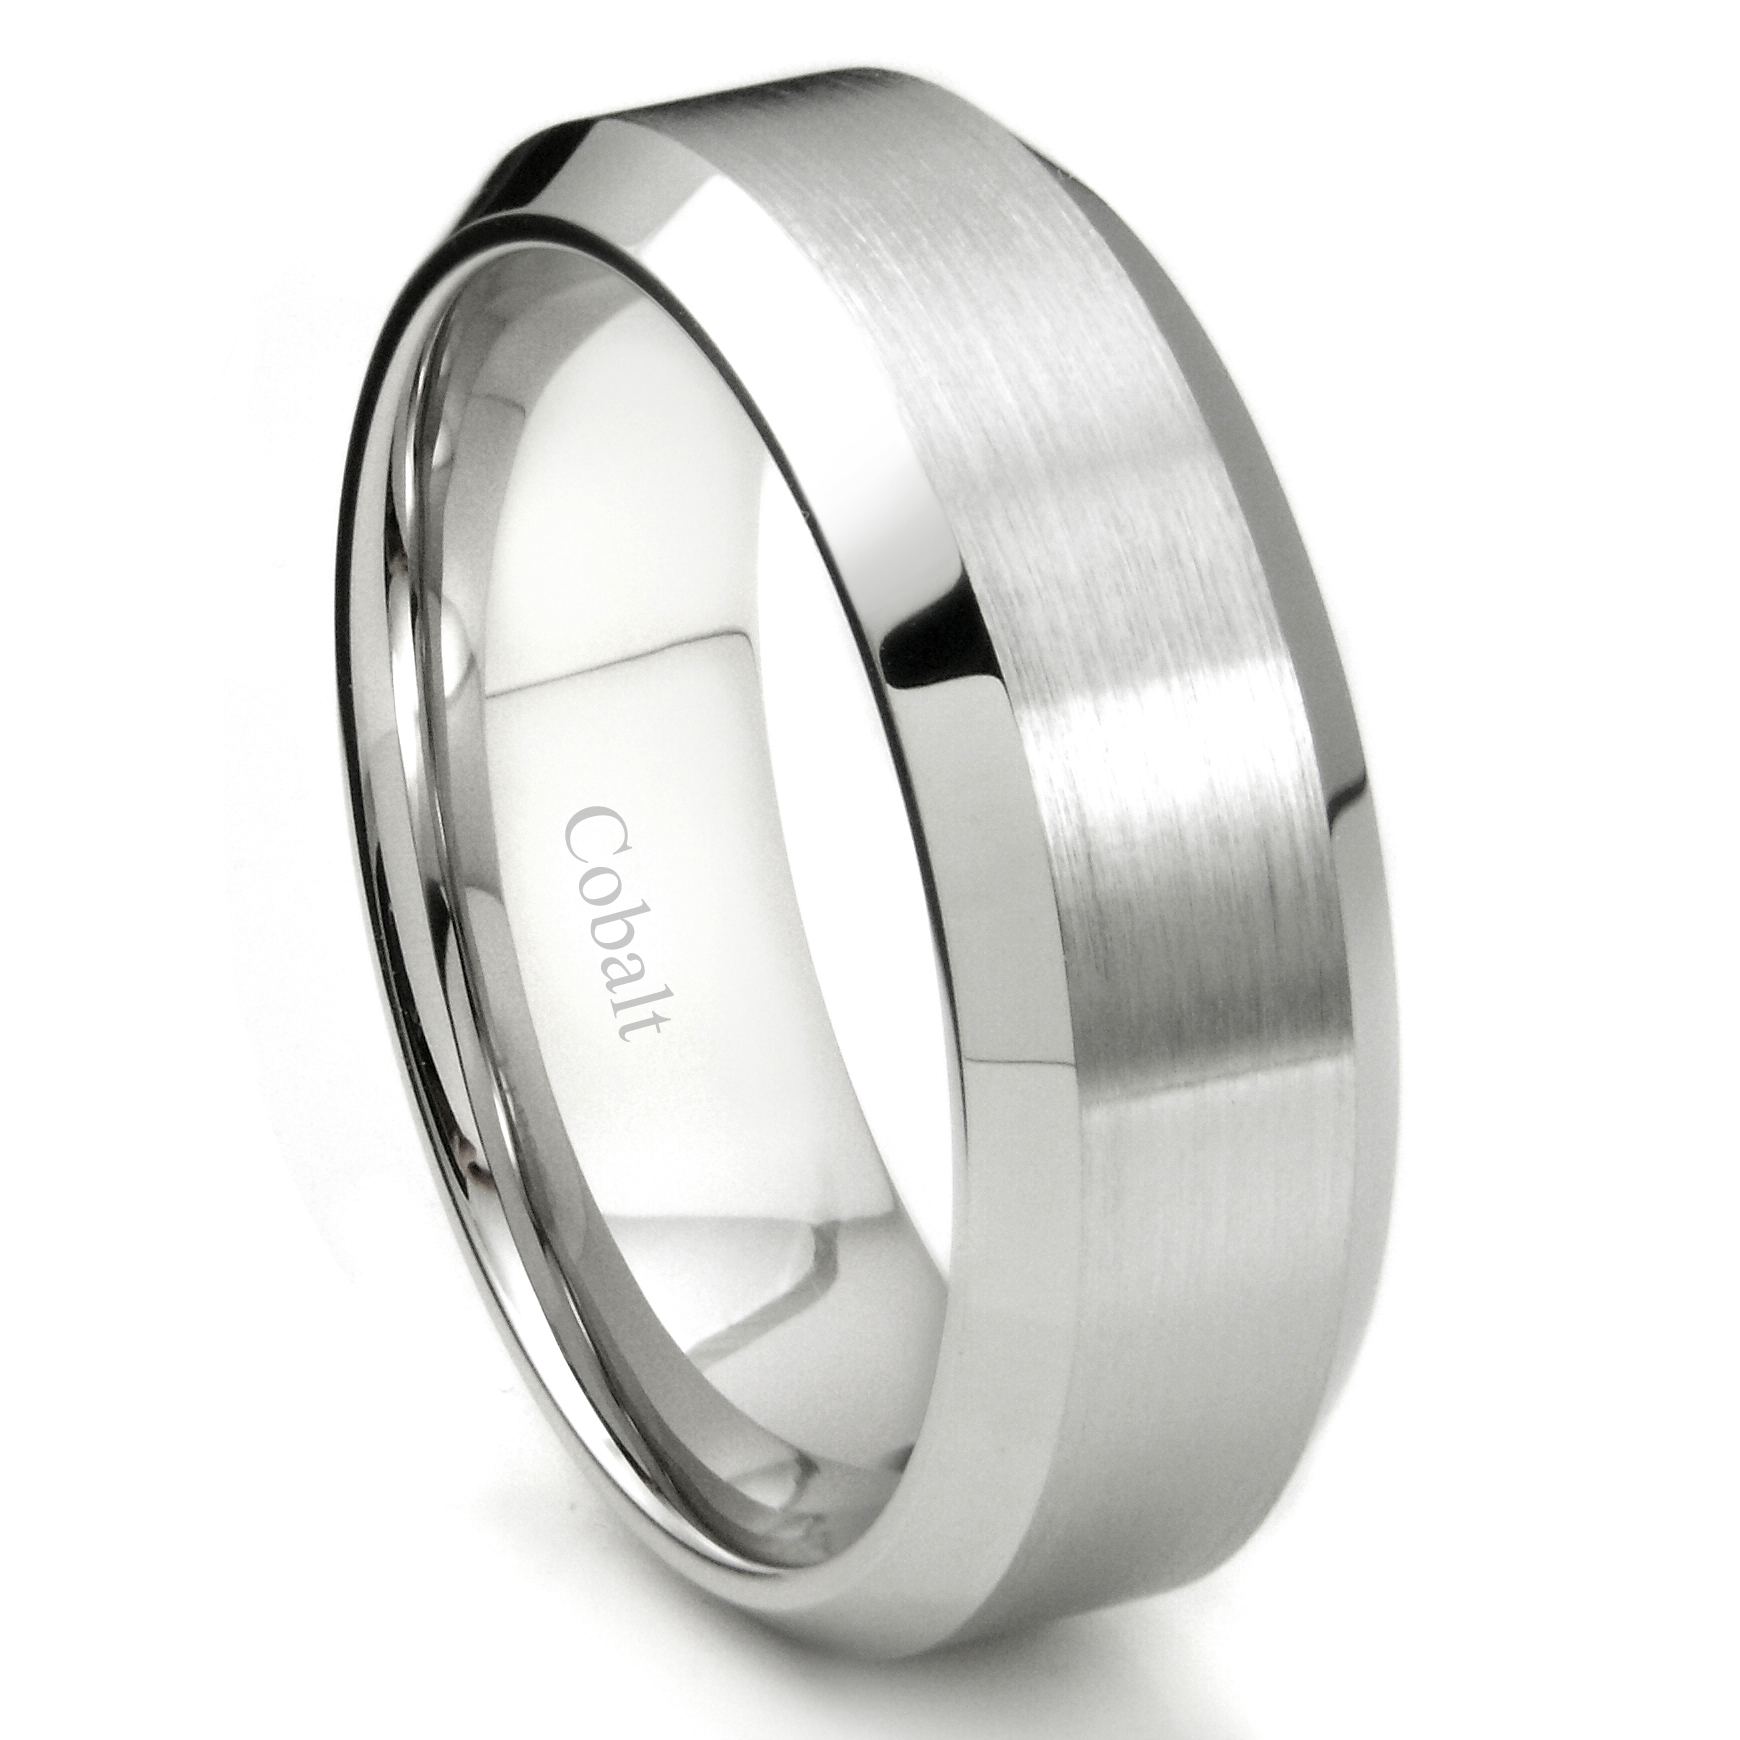 Cobalt XF Chrome 8MM Brush Finish Bevel Edge Wedding Band Ring